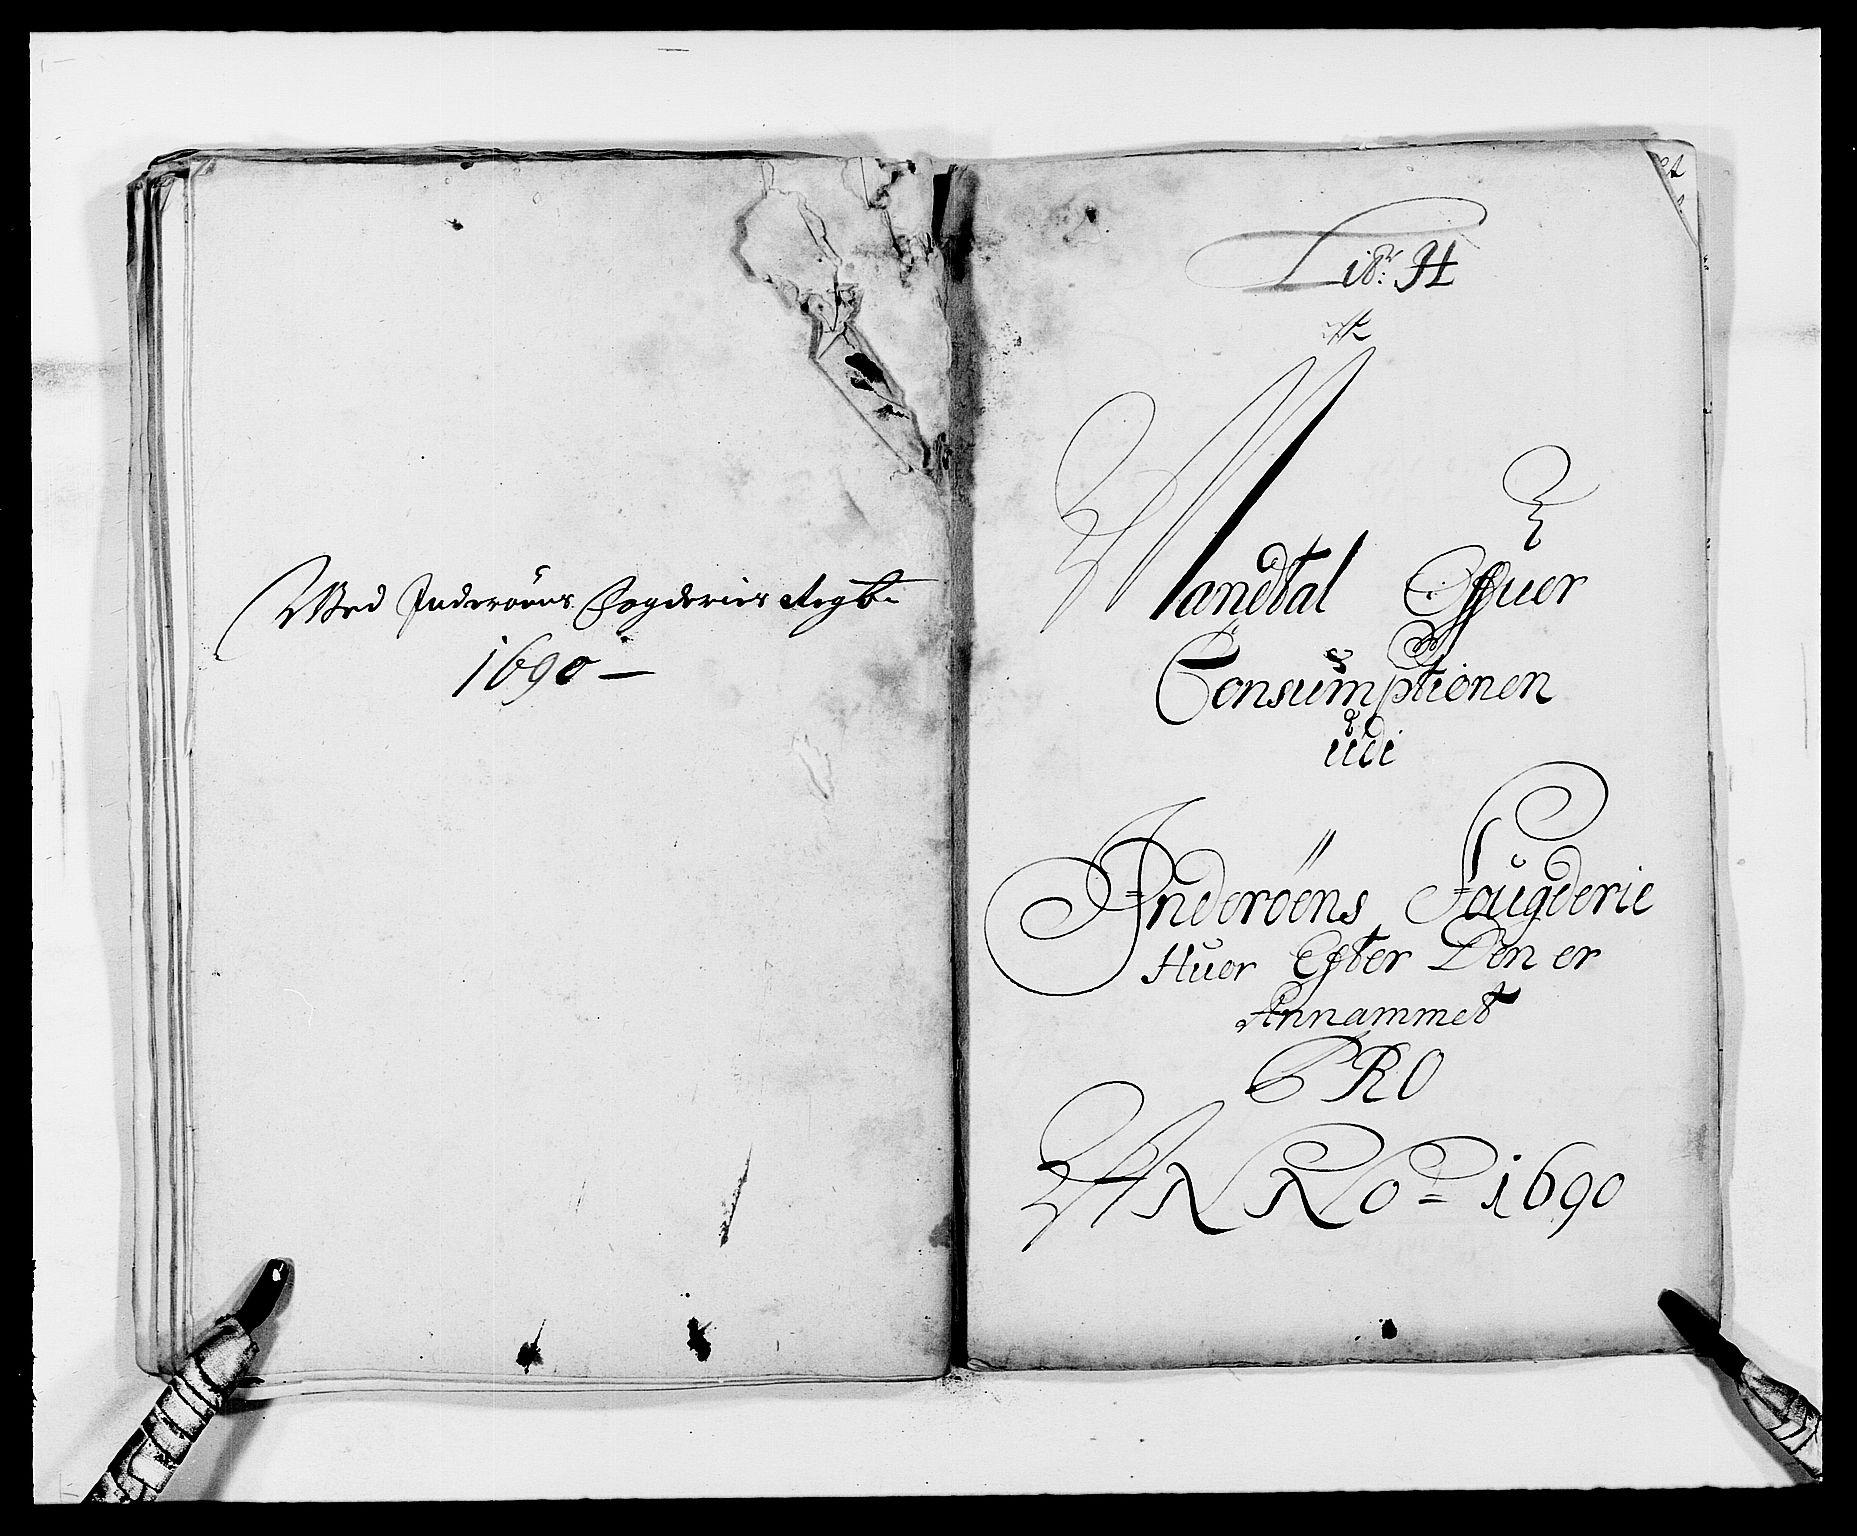 RA, Rentekammeret inntil 1814, Reviderte regnskaper, Fogderegnskap, R63/L4307: Fogderegnskap Inderøy, 1690-1691, s. 113